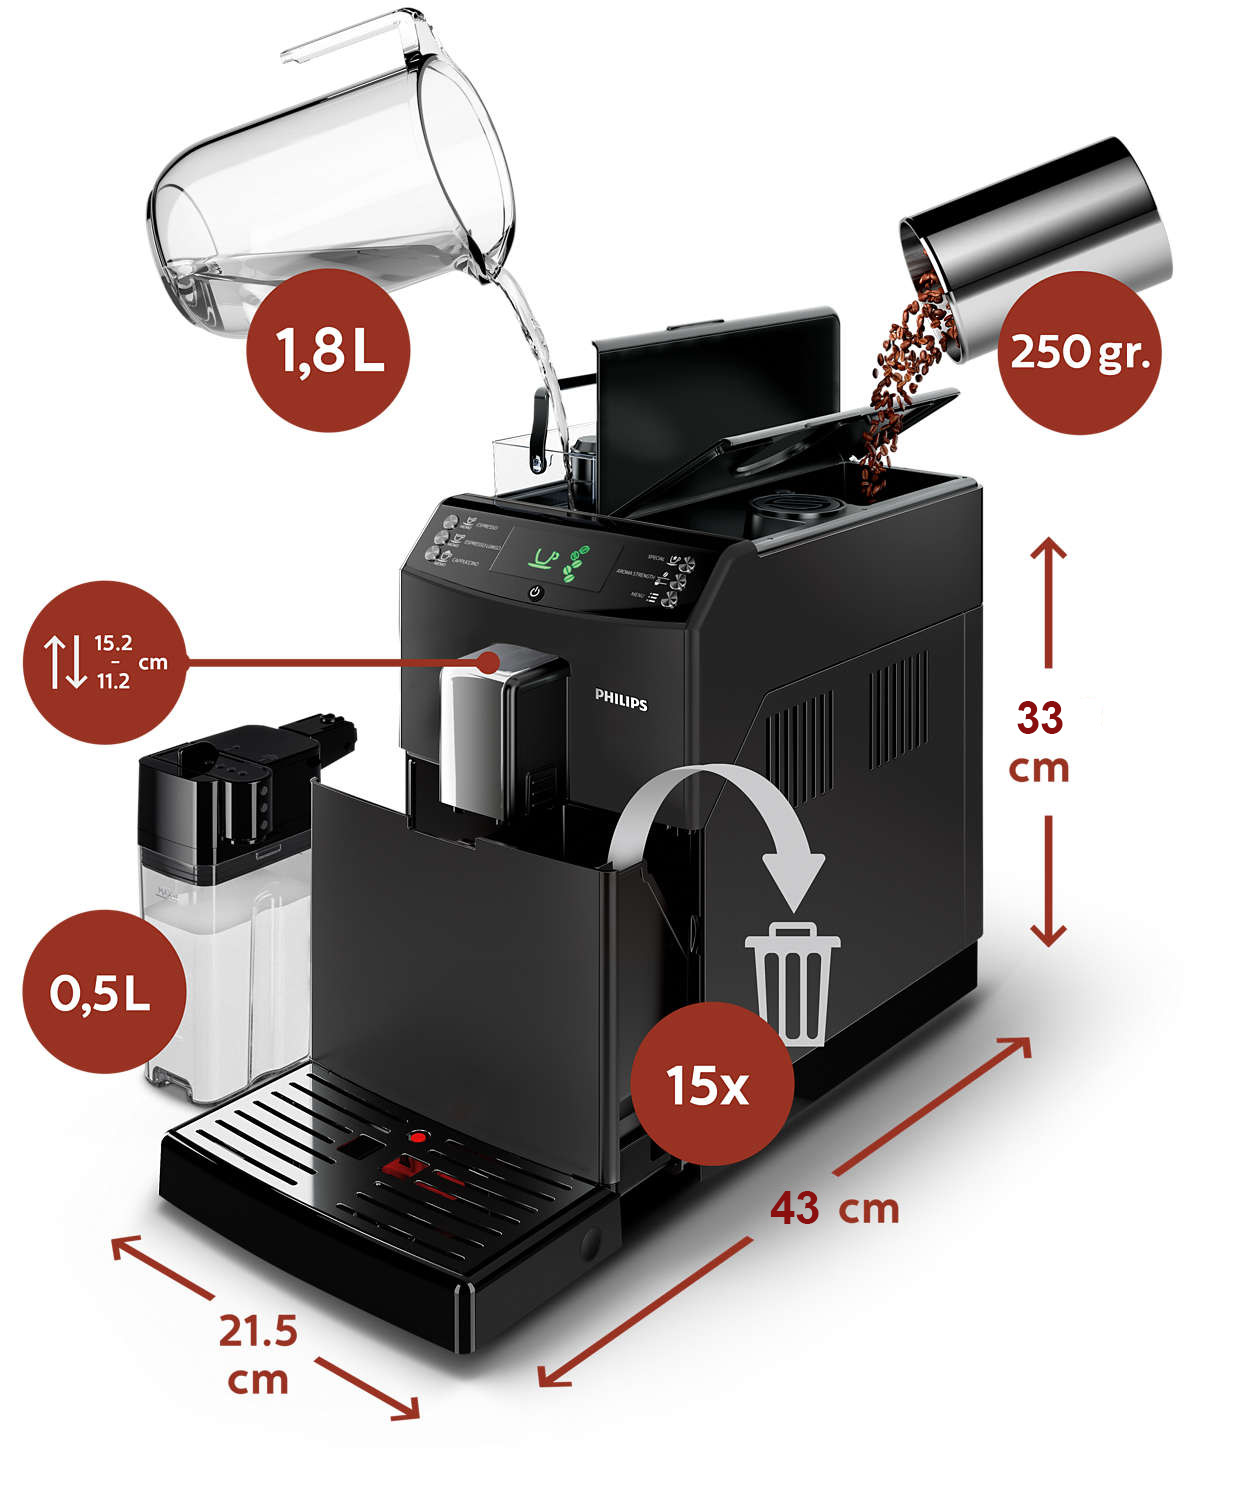 Технические характеристики кофемашины Philips HD8828